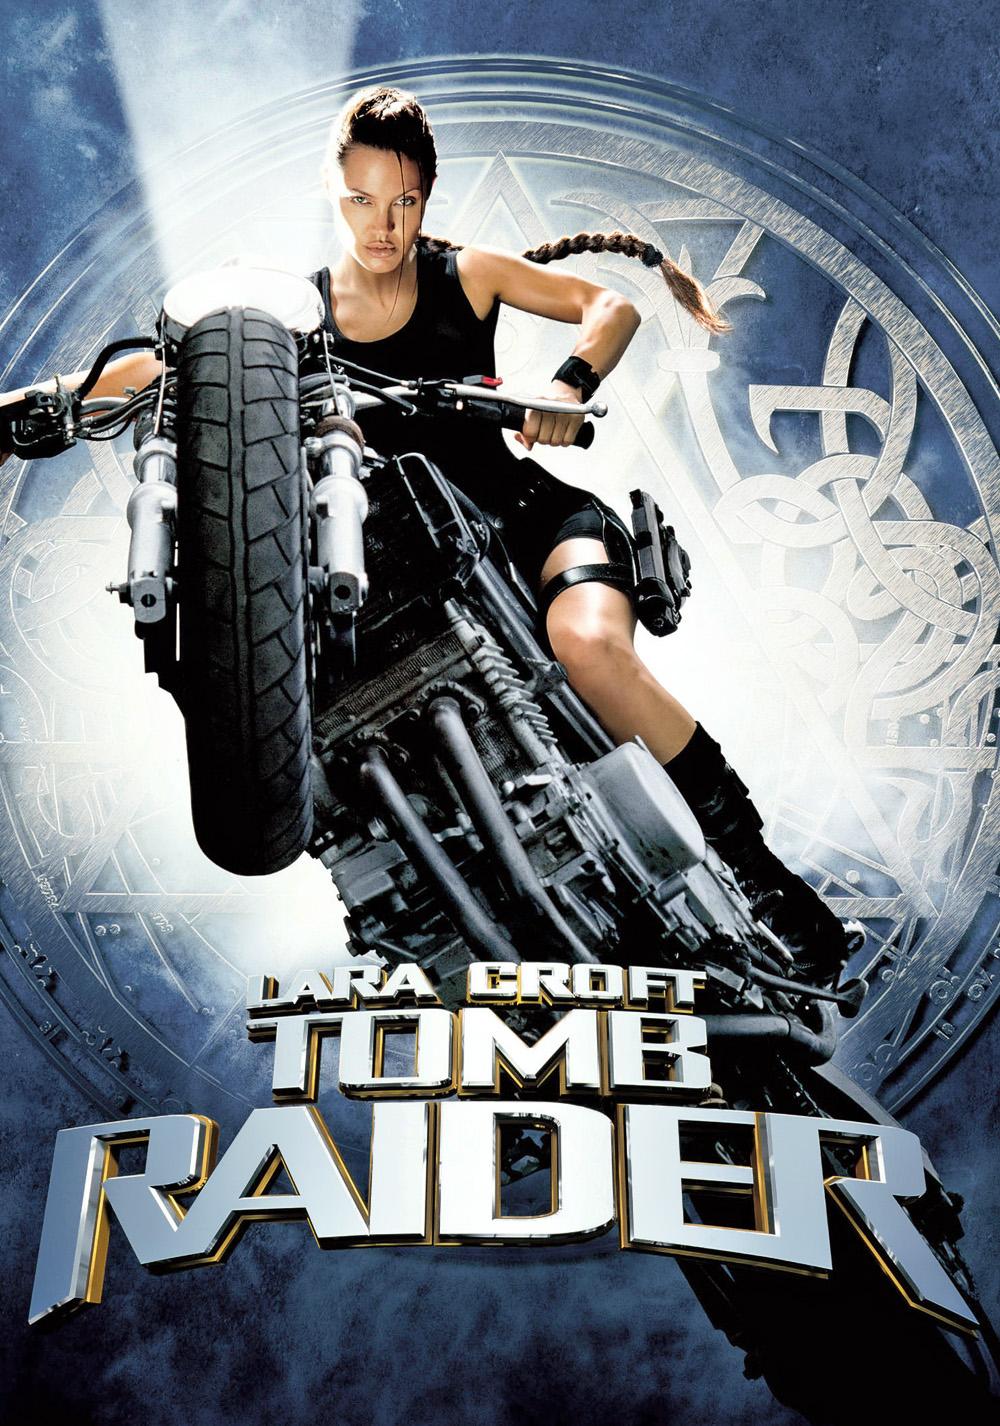 Lara Croft Tomb Raider Movie Fanart Fanart Tv